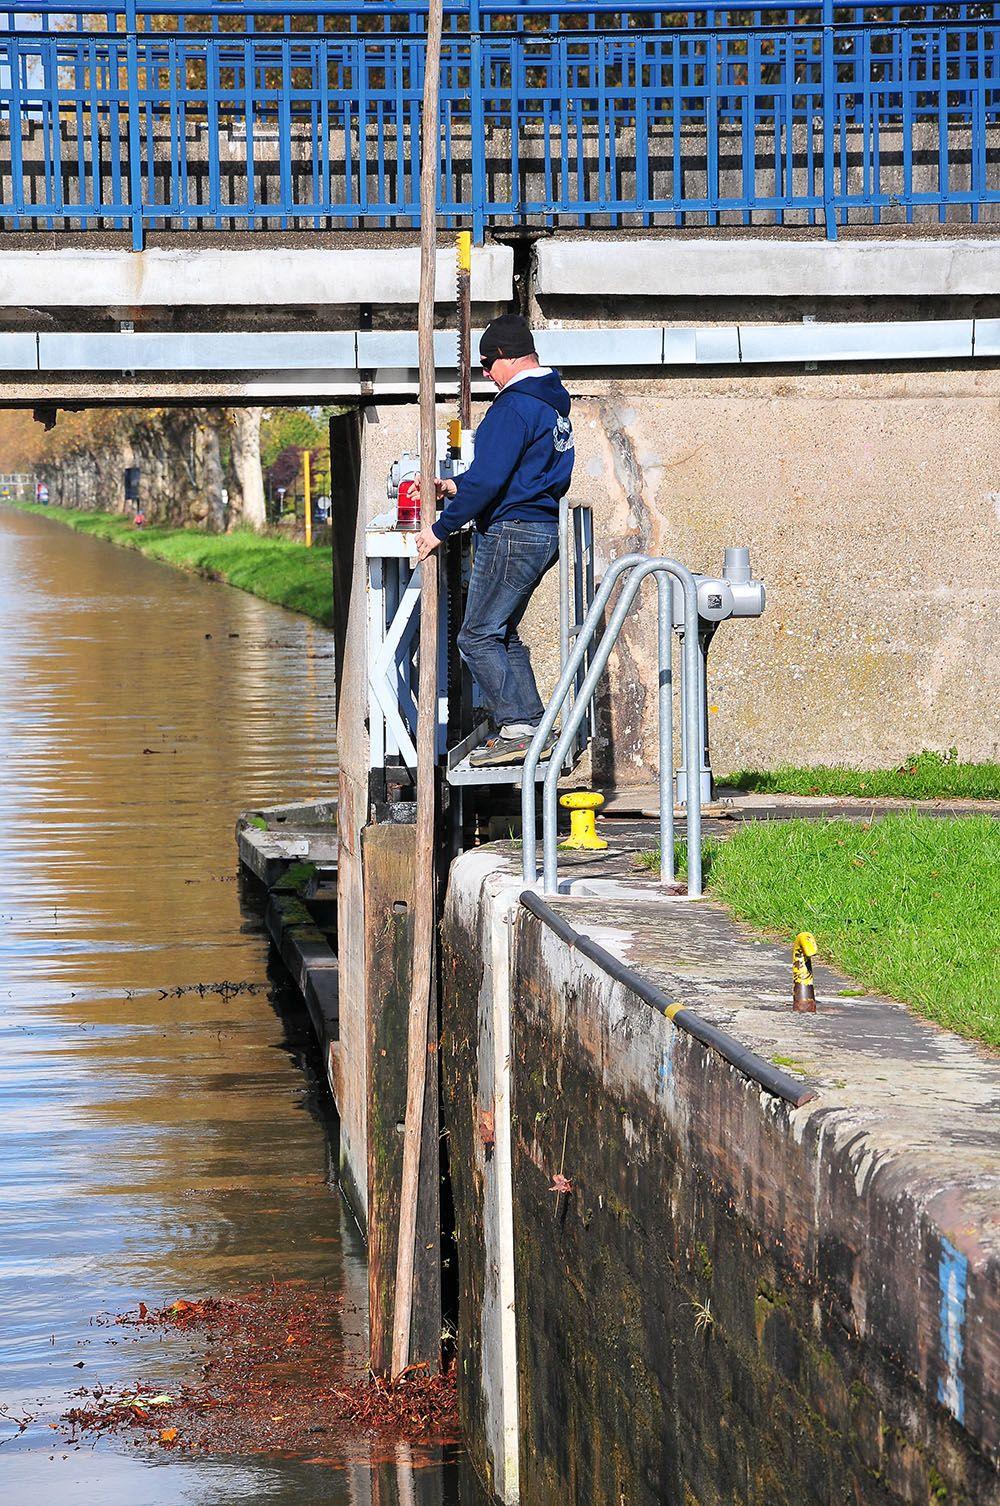 conduire bateau croisière fluviale, écluse